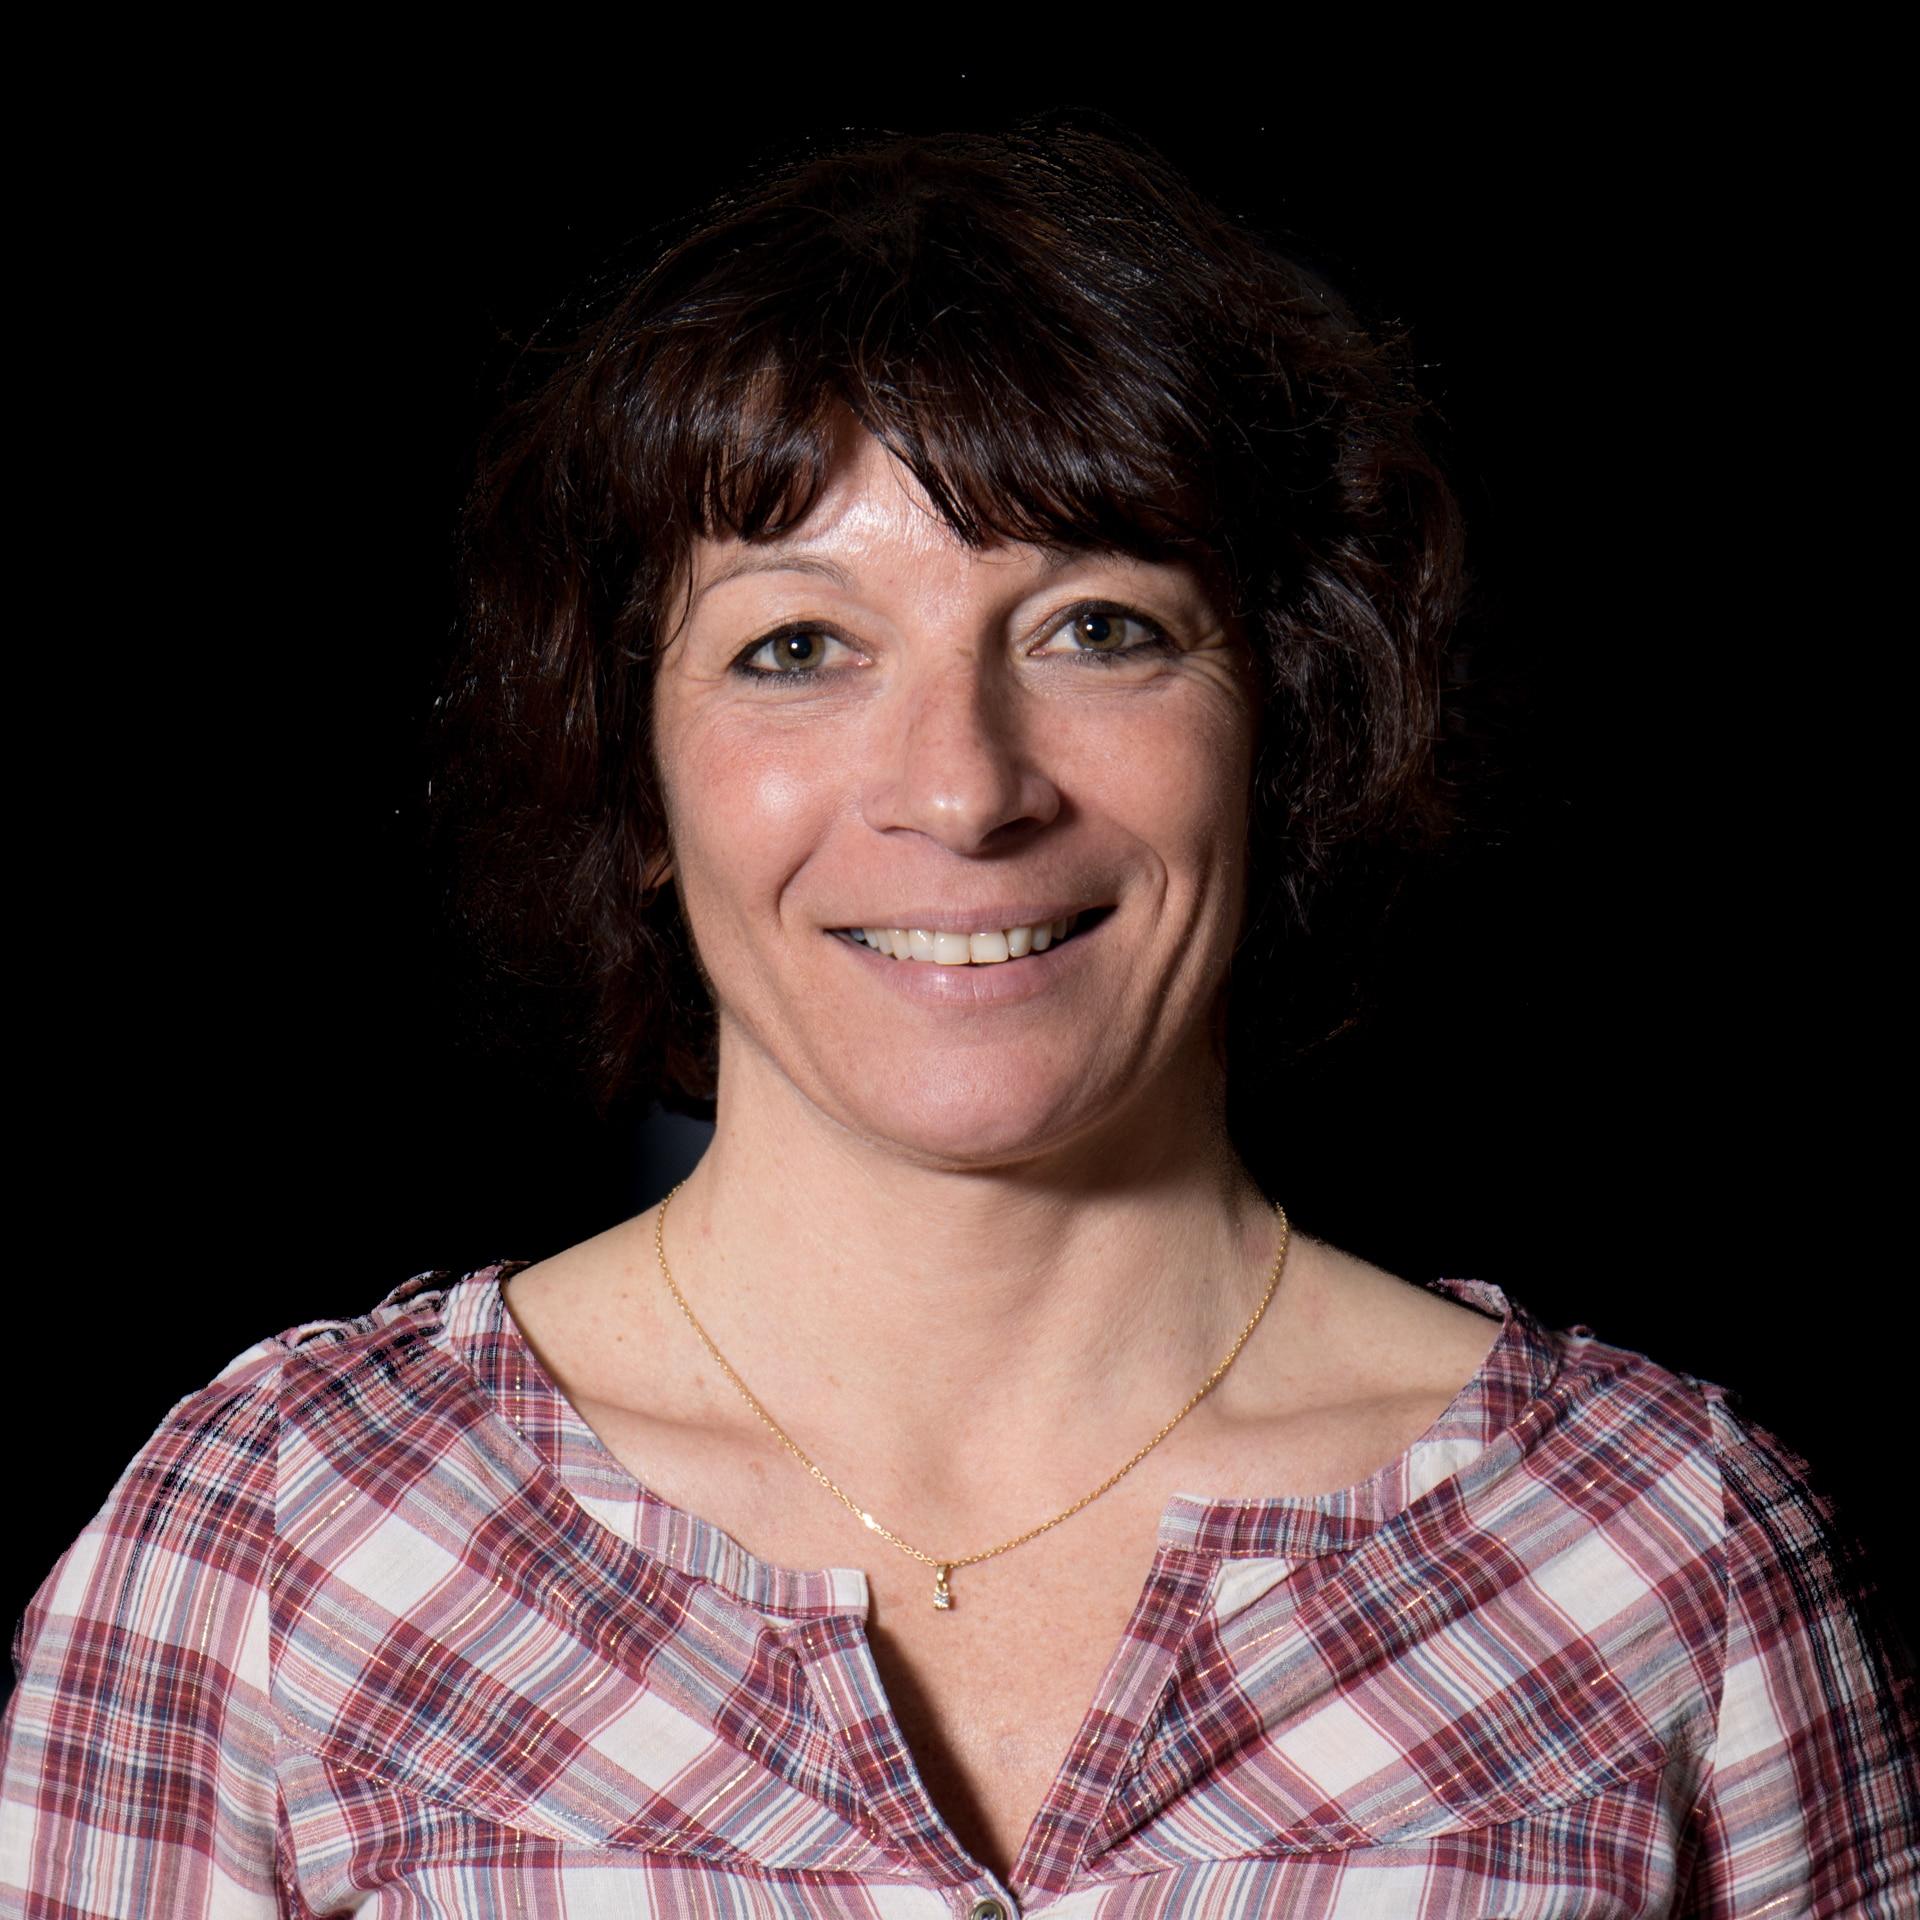 Fabienne DE GAULEJAC